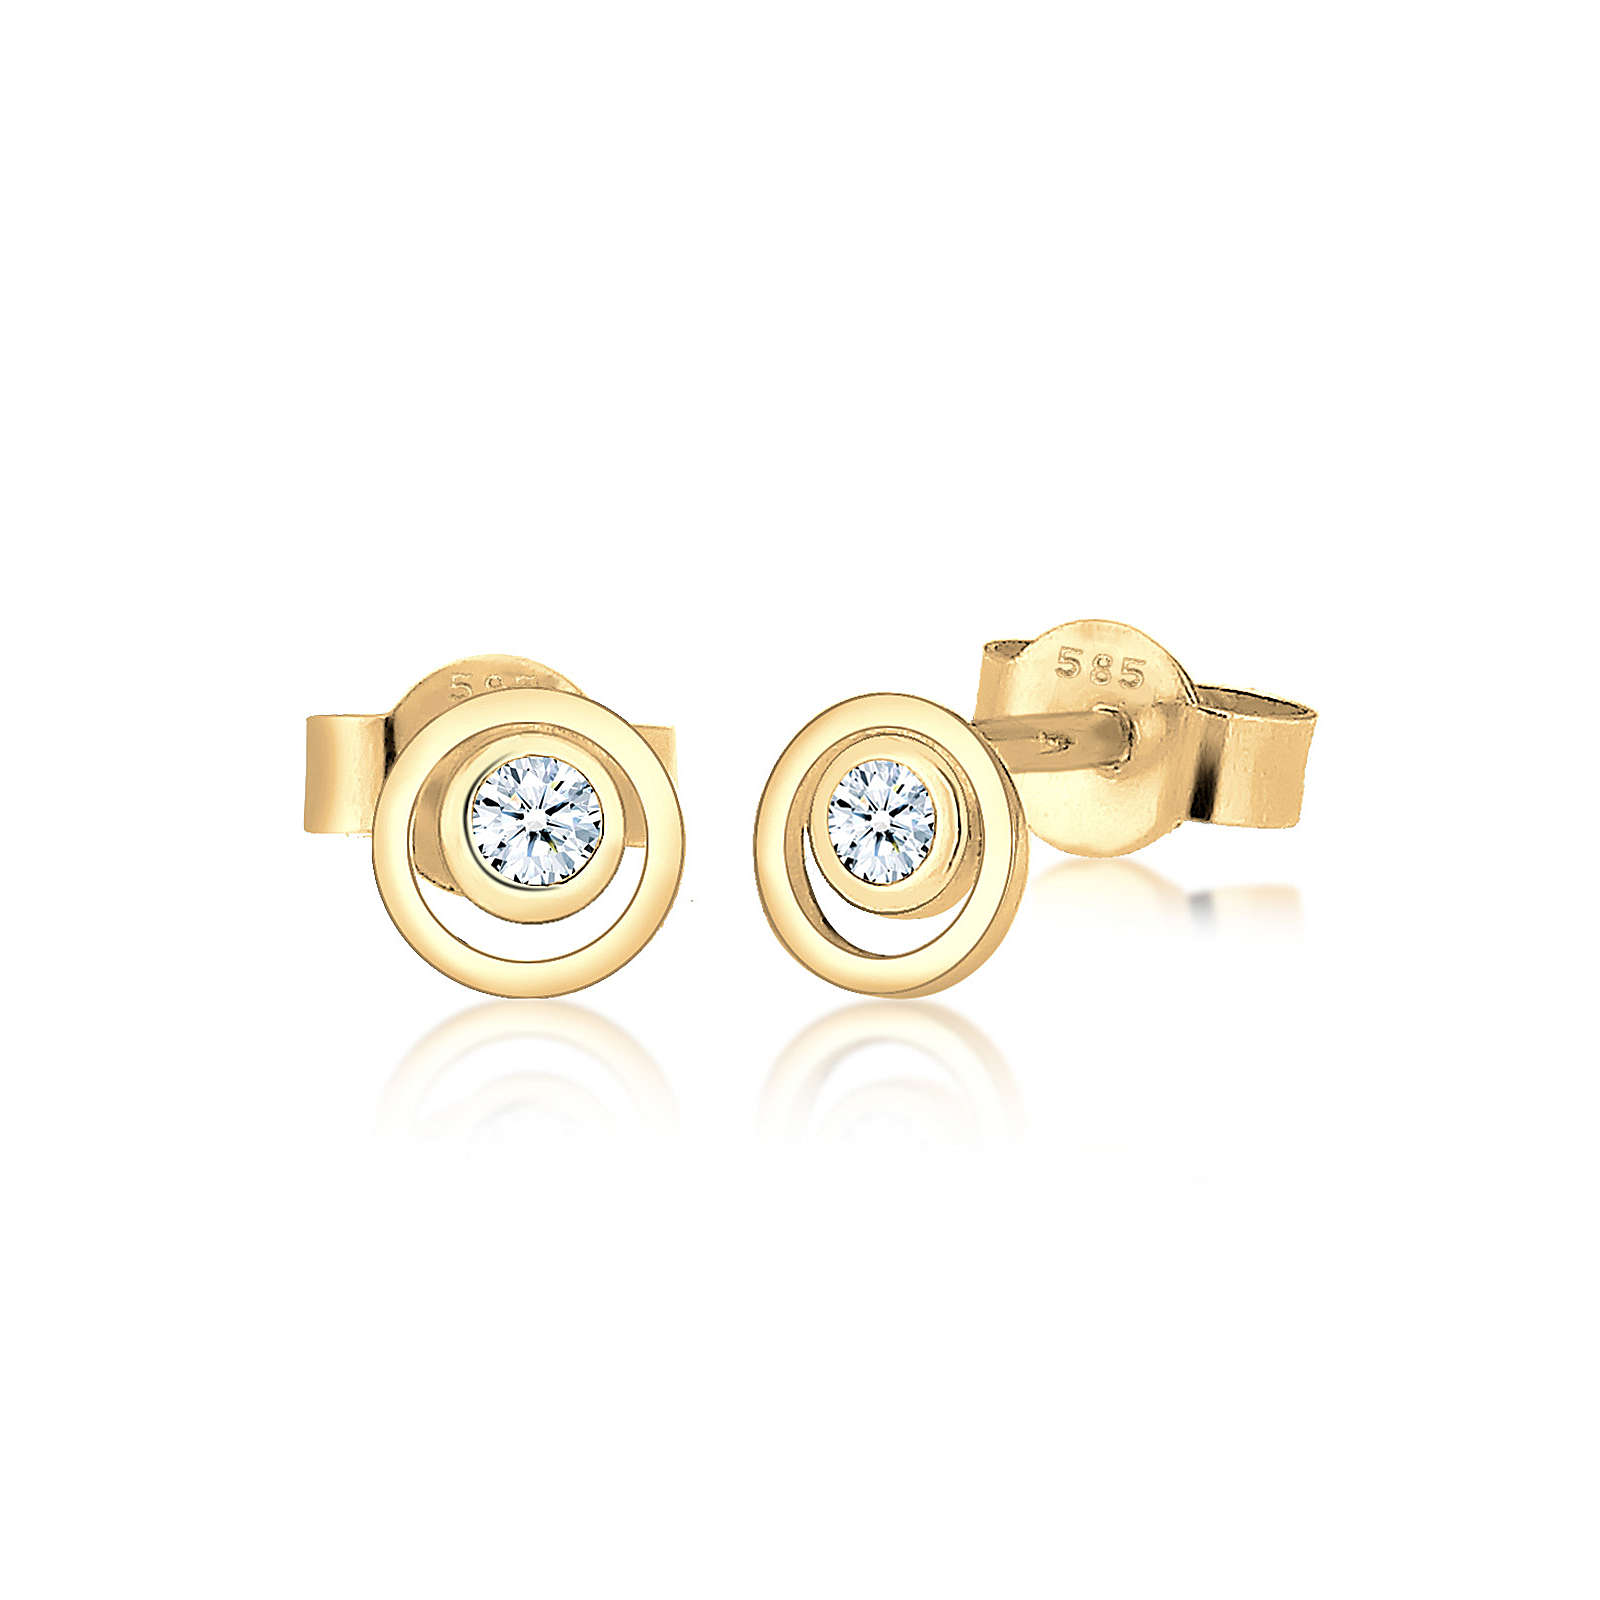 Diamore Ohrringe Kreis Layer Diamant Hochwertig 585 Gelbgold Ohrringe gold Damen Gr. one size